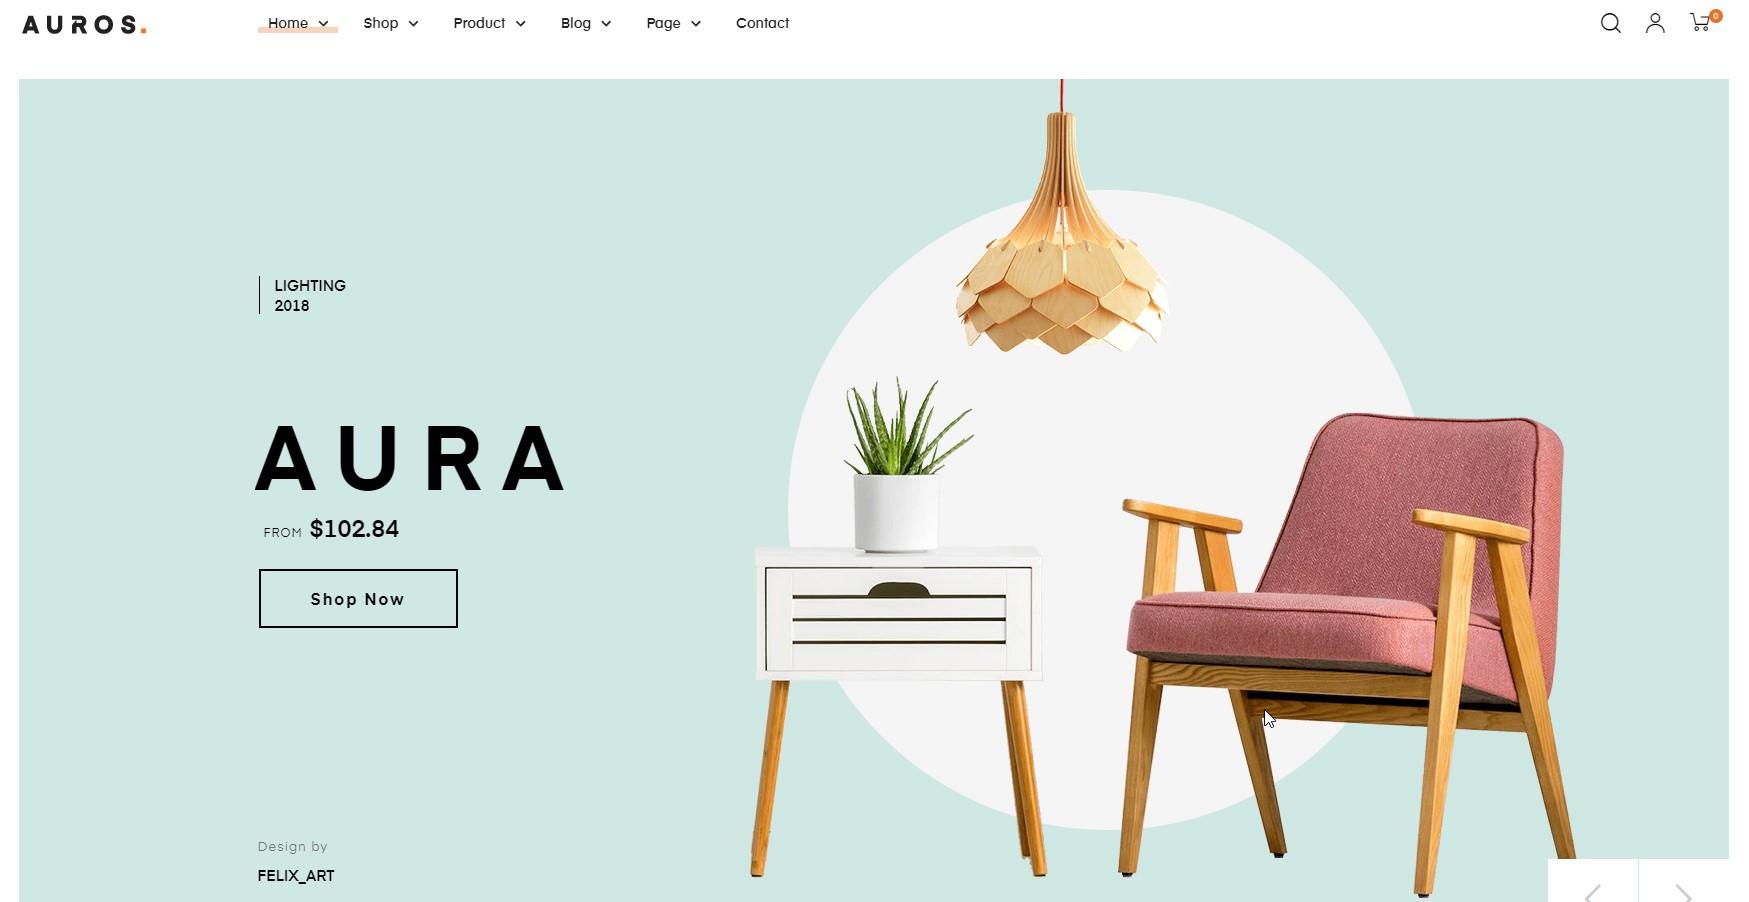 Auros - Furniture Elementor WooCommerce WordPress Theme